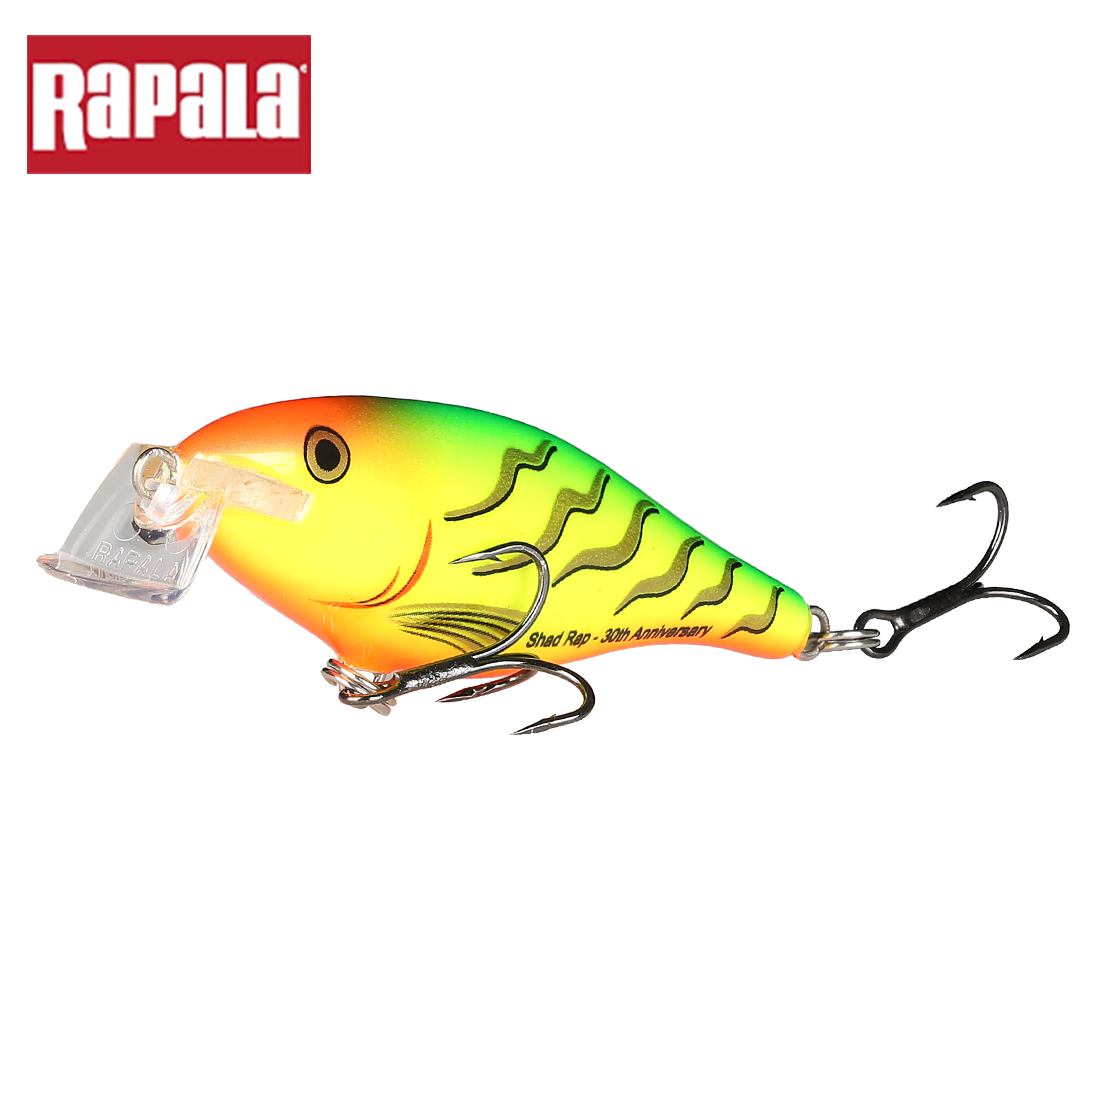 Rapala Wobbler Rippin Rap RPR07 Ripping Rap 7cm Pearl Grey Shiner PGS